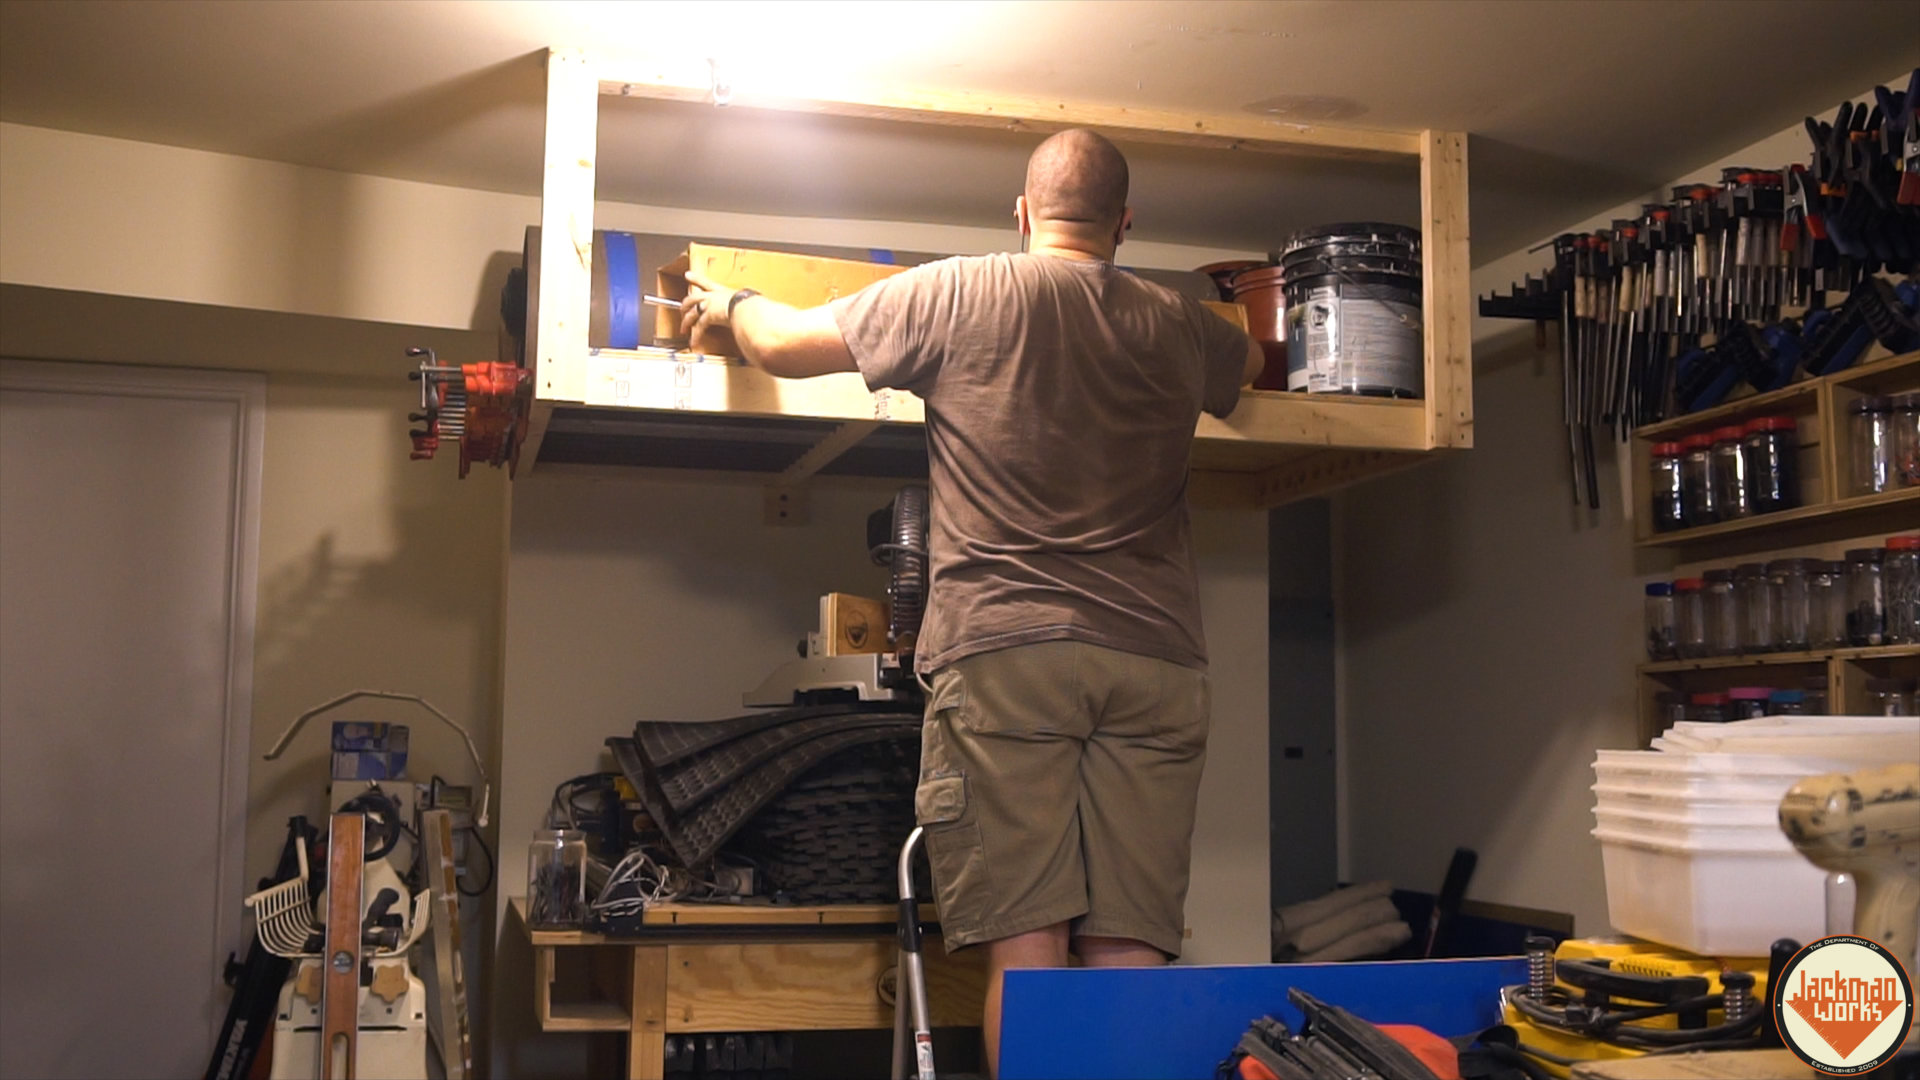 Floating garage storage loft and clamp rack 20 jackman works for Diy garage storage loft